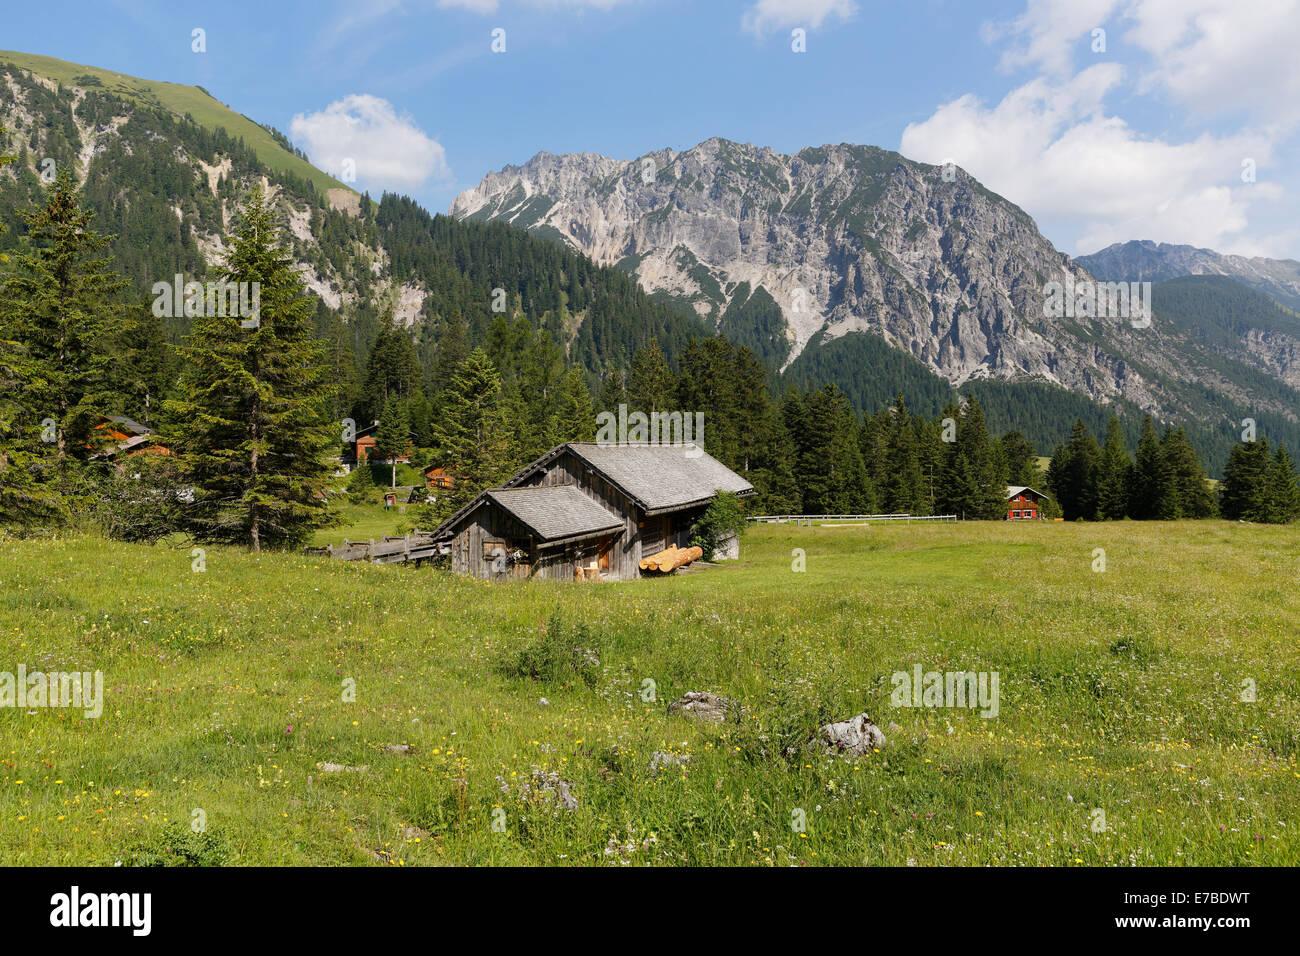 Nenzinger Himmel alpine village, in the back Rauher Berg, Gamperdonatal, Nenzing community, Rätikon, Vorarlberg, - Stock Image